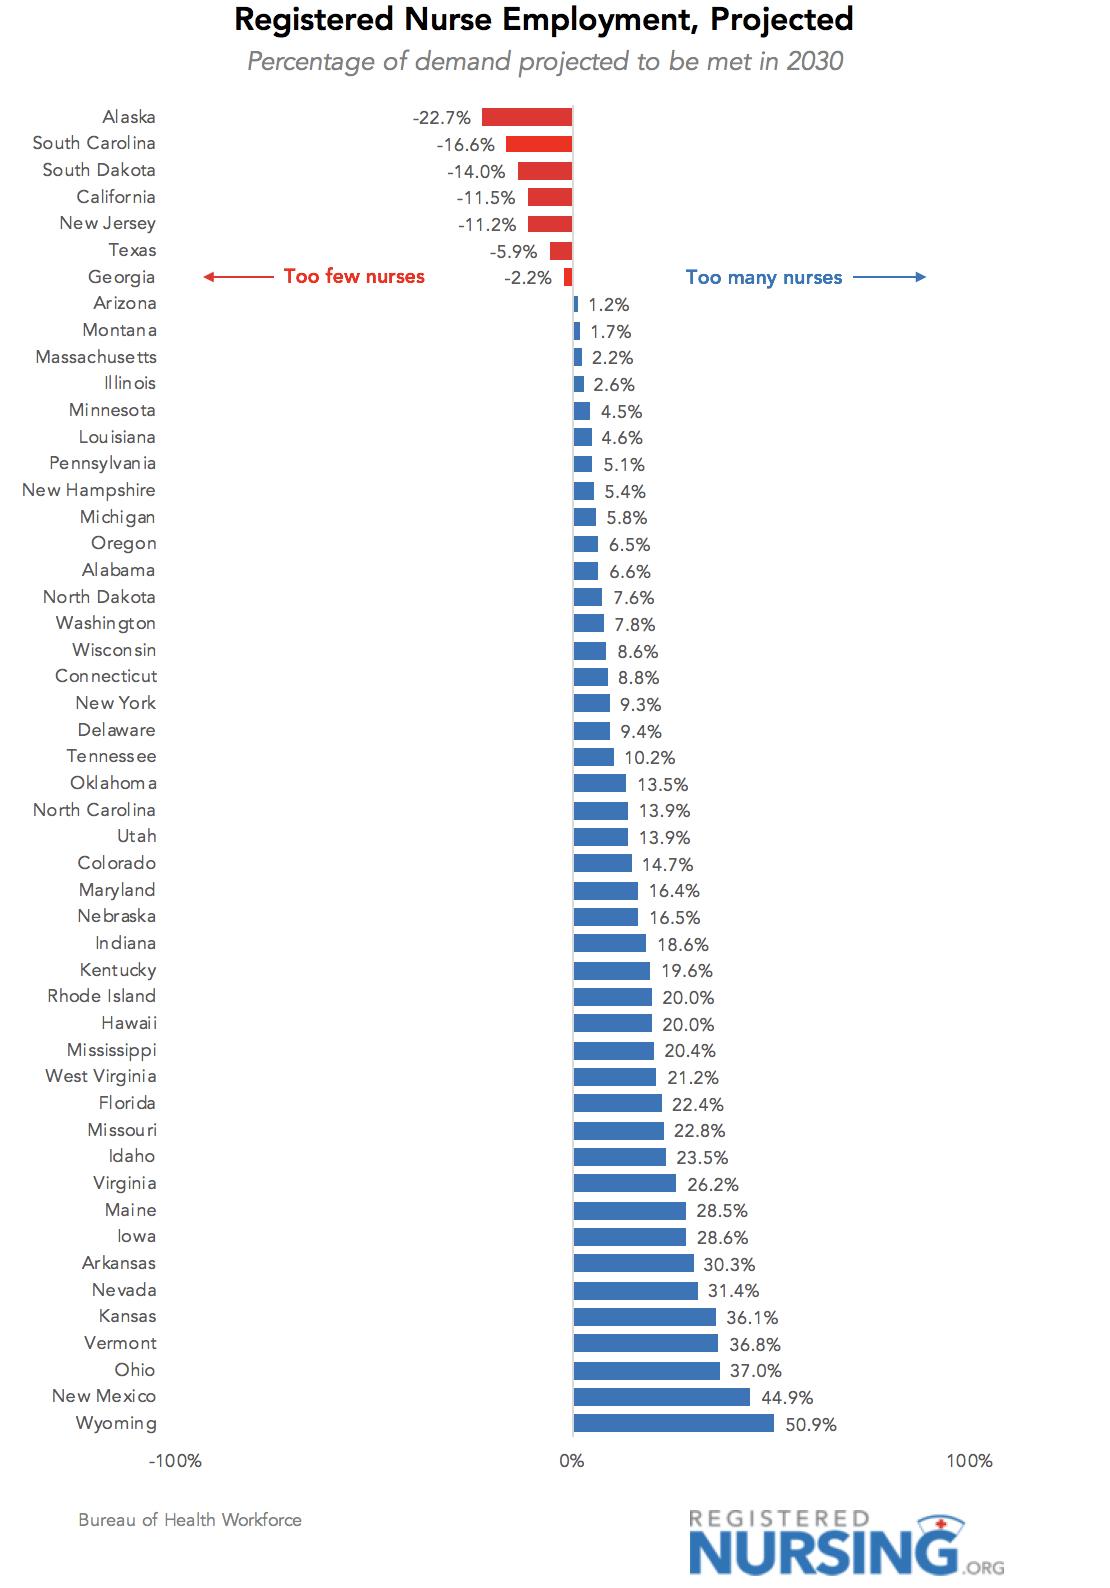 The Places with the Largest Nursing Shortages  RegisteredNursingorg